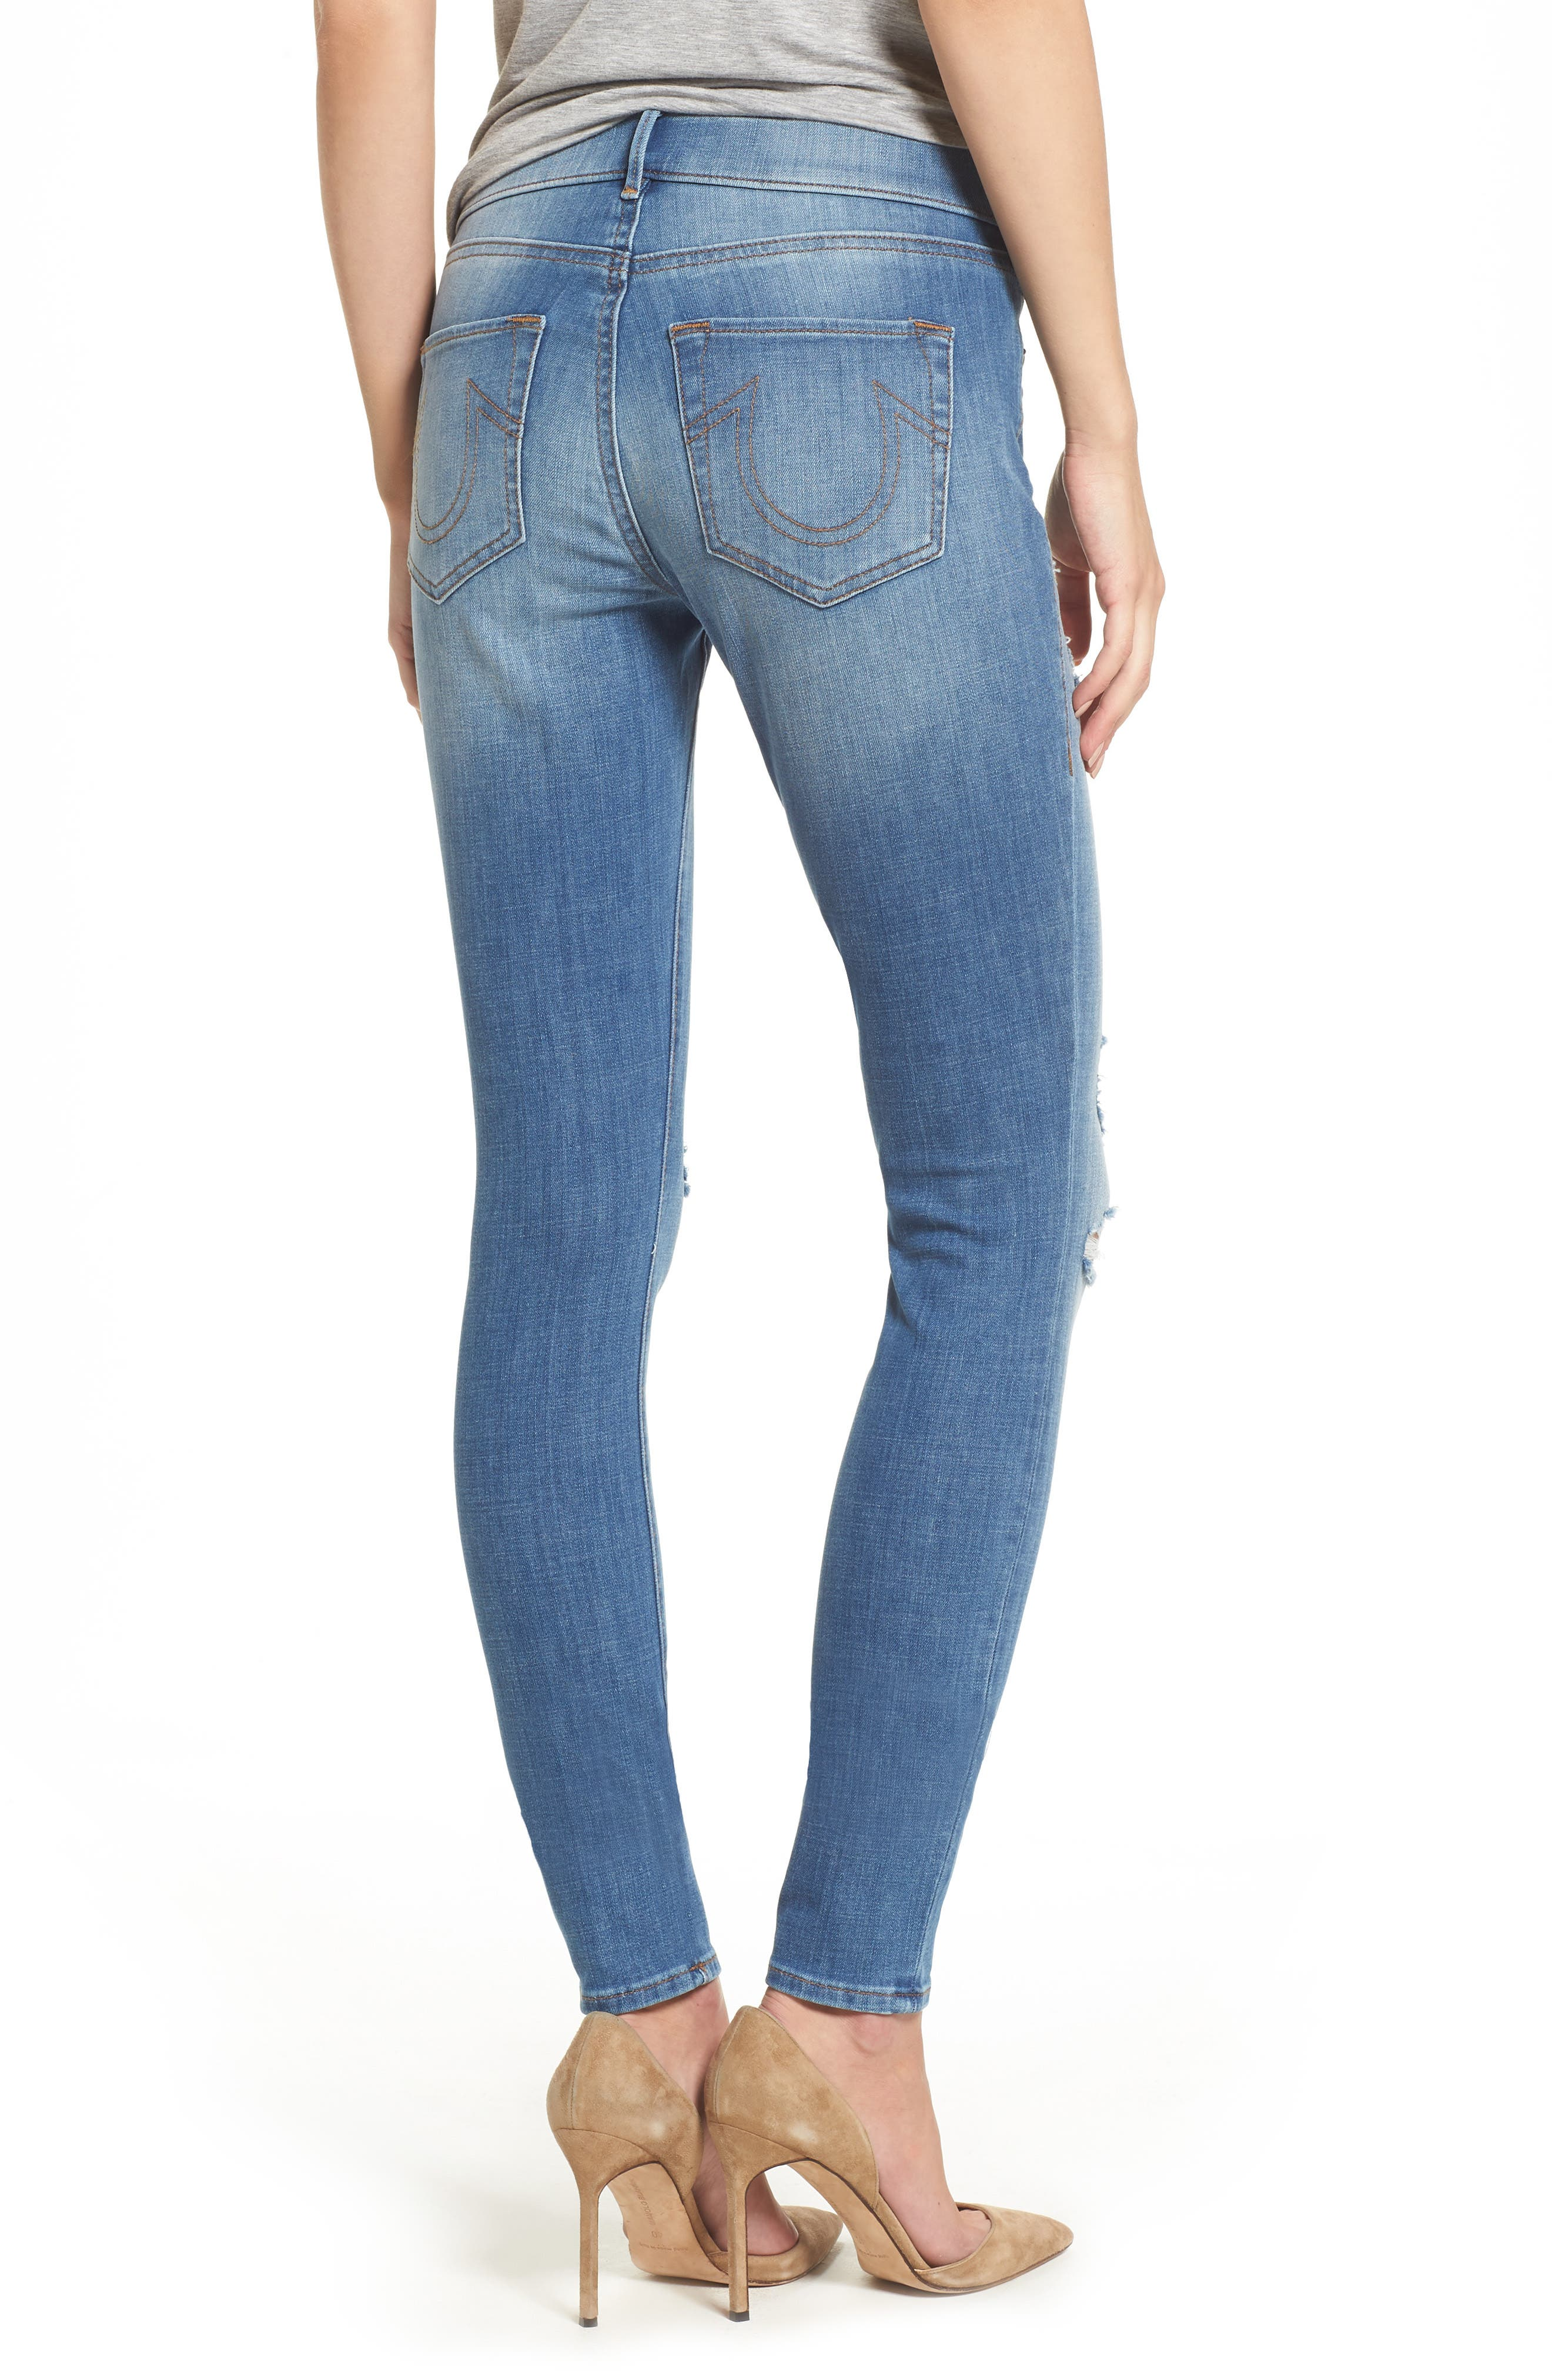 Jennie Runway Curvy Skinny Jeans,                             Alternate thumbnail 2, color,                             400